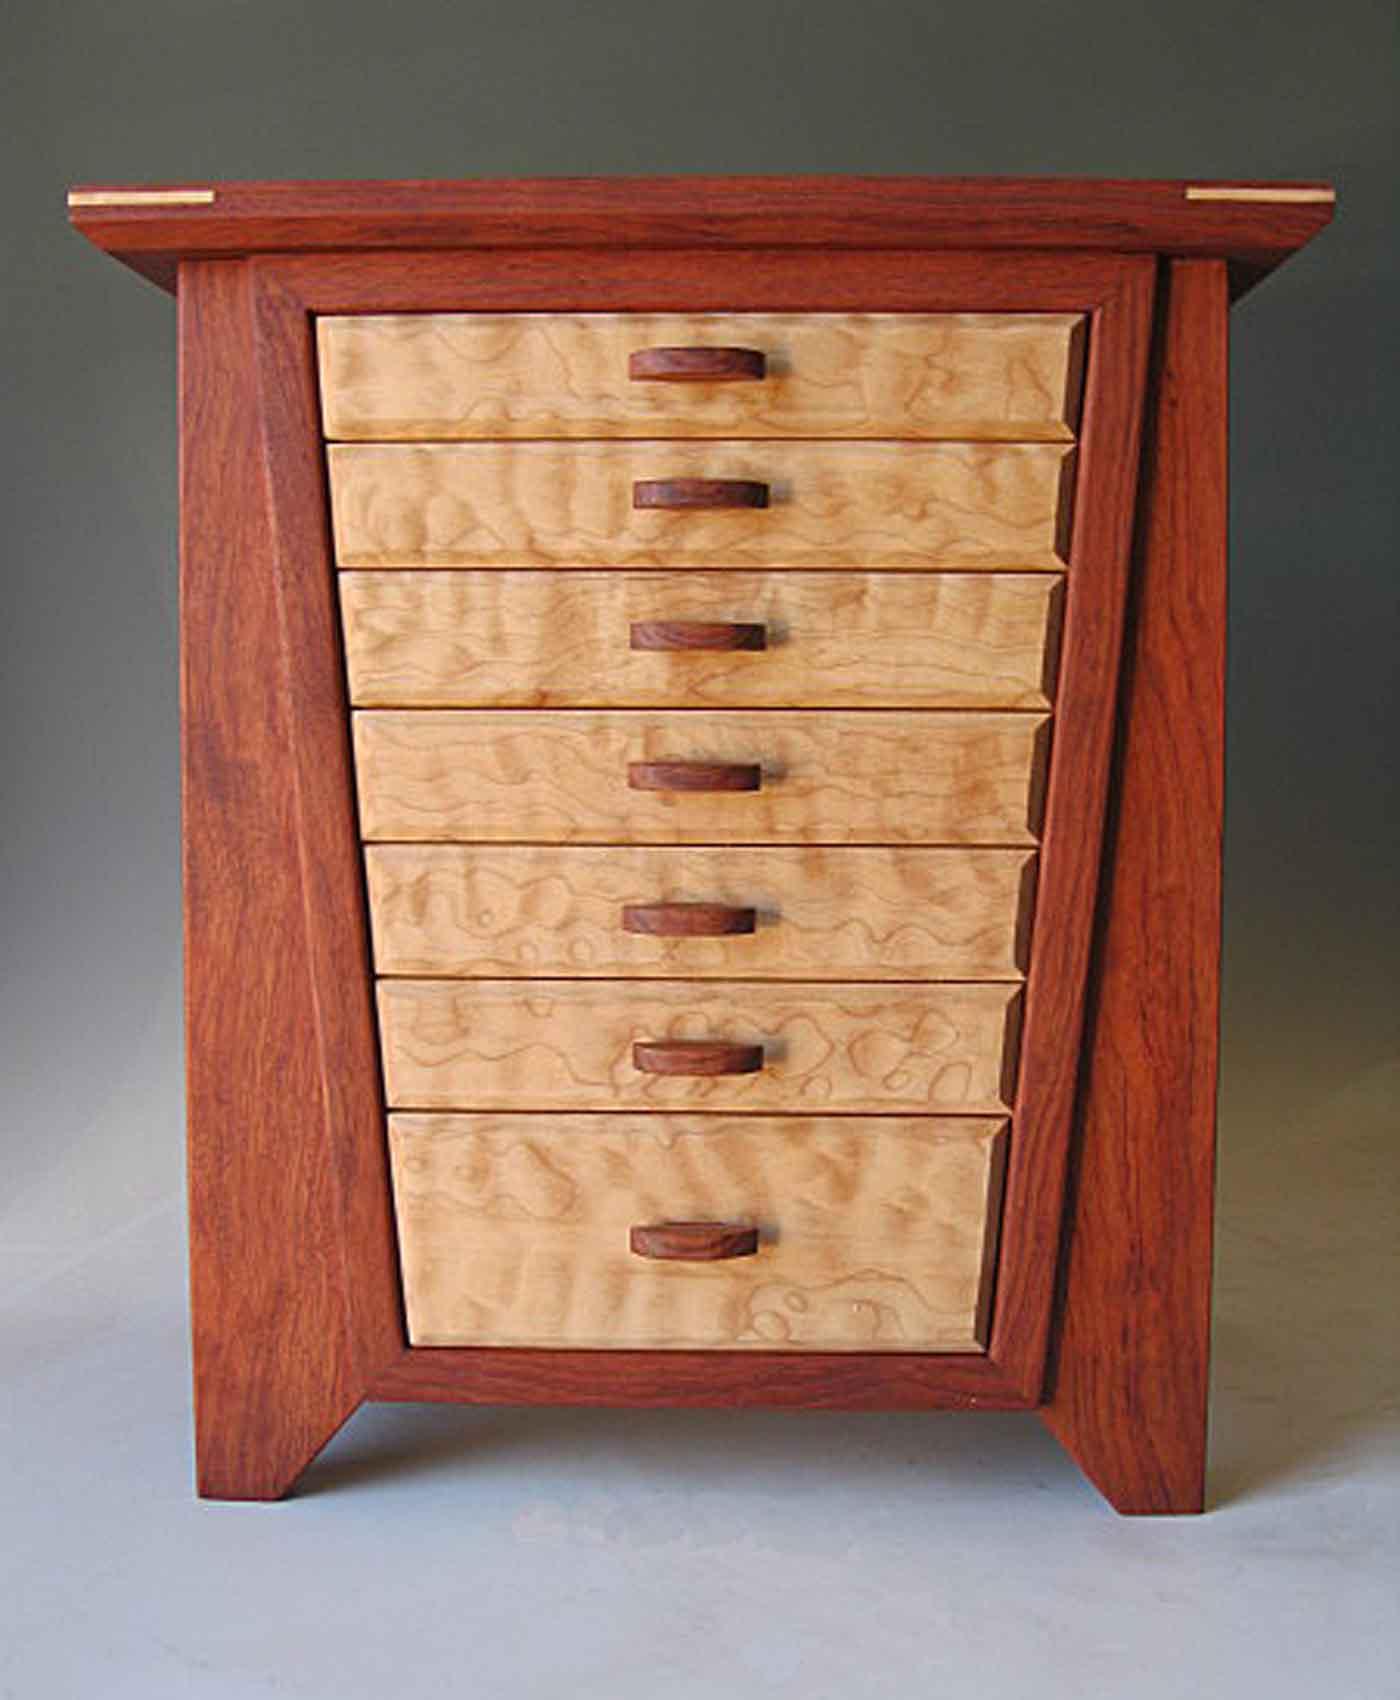 Handmade quality jewelry box made of bubinga wood and burl; with seven drawers